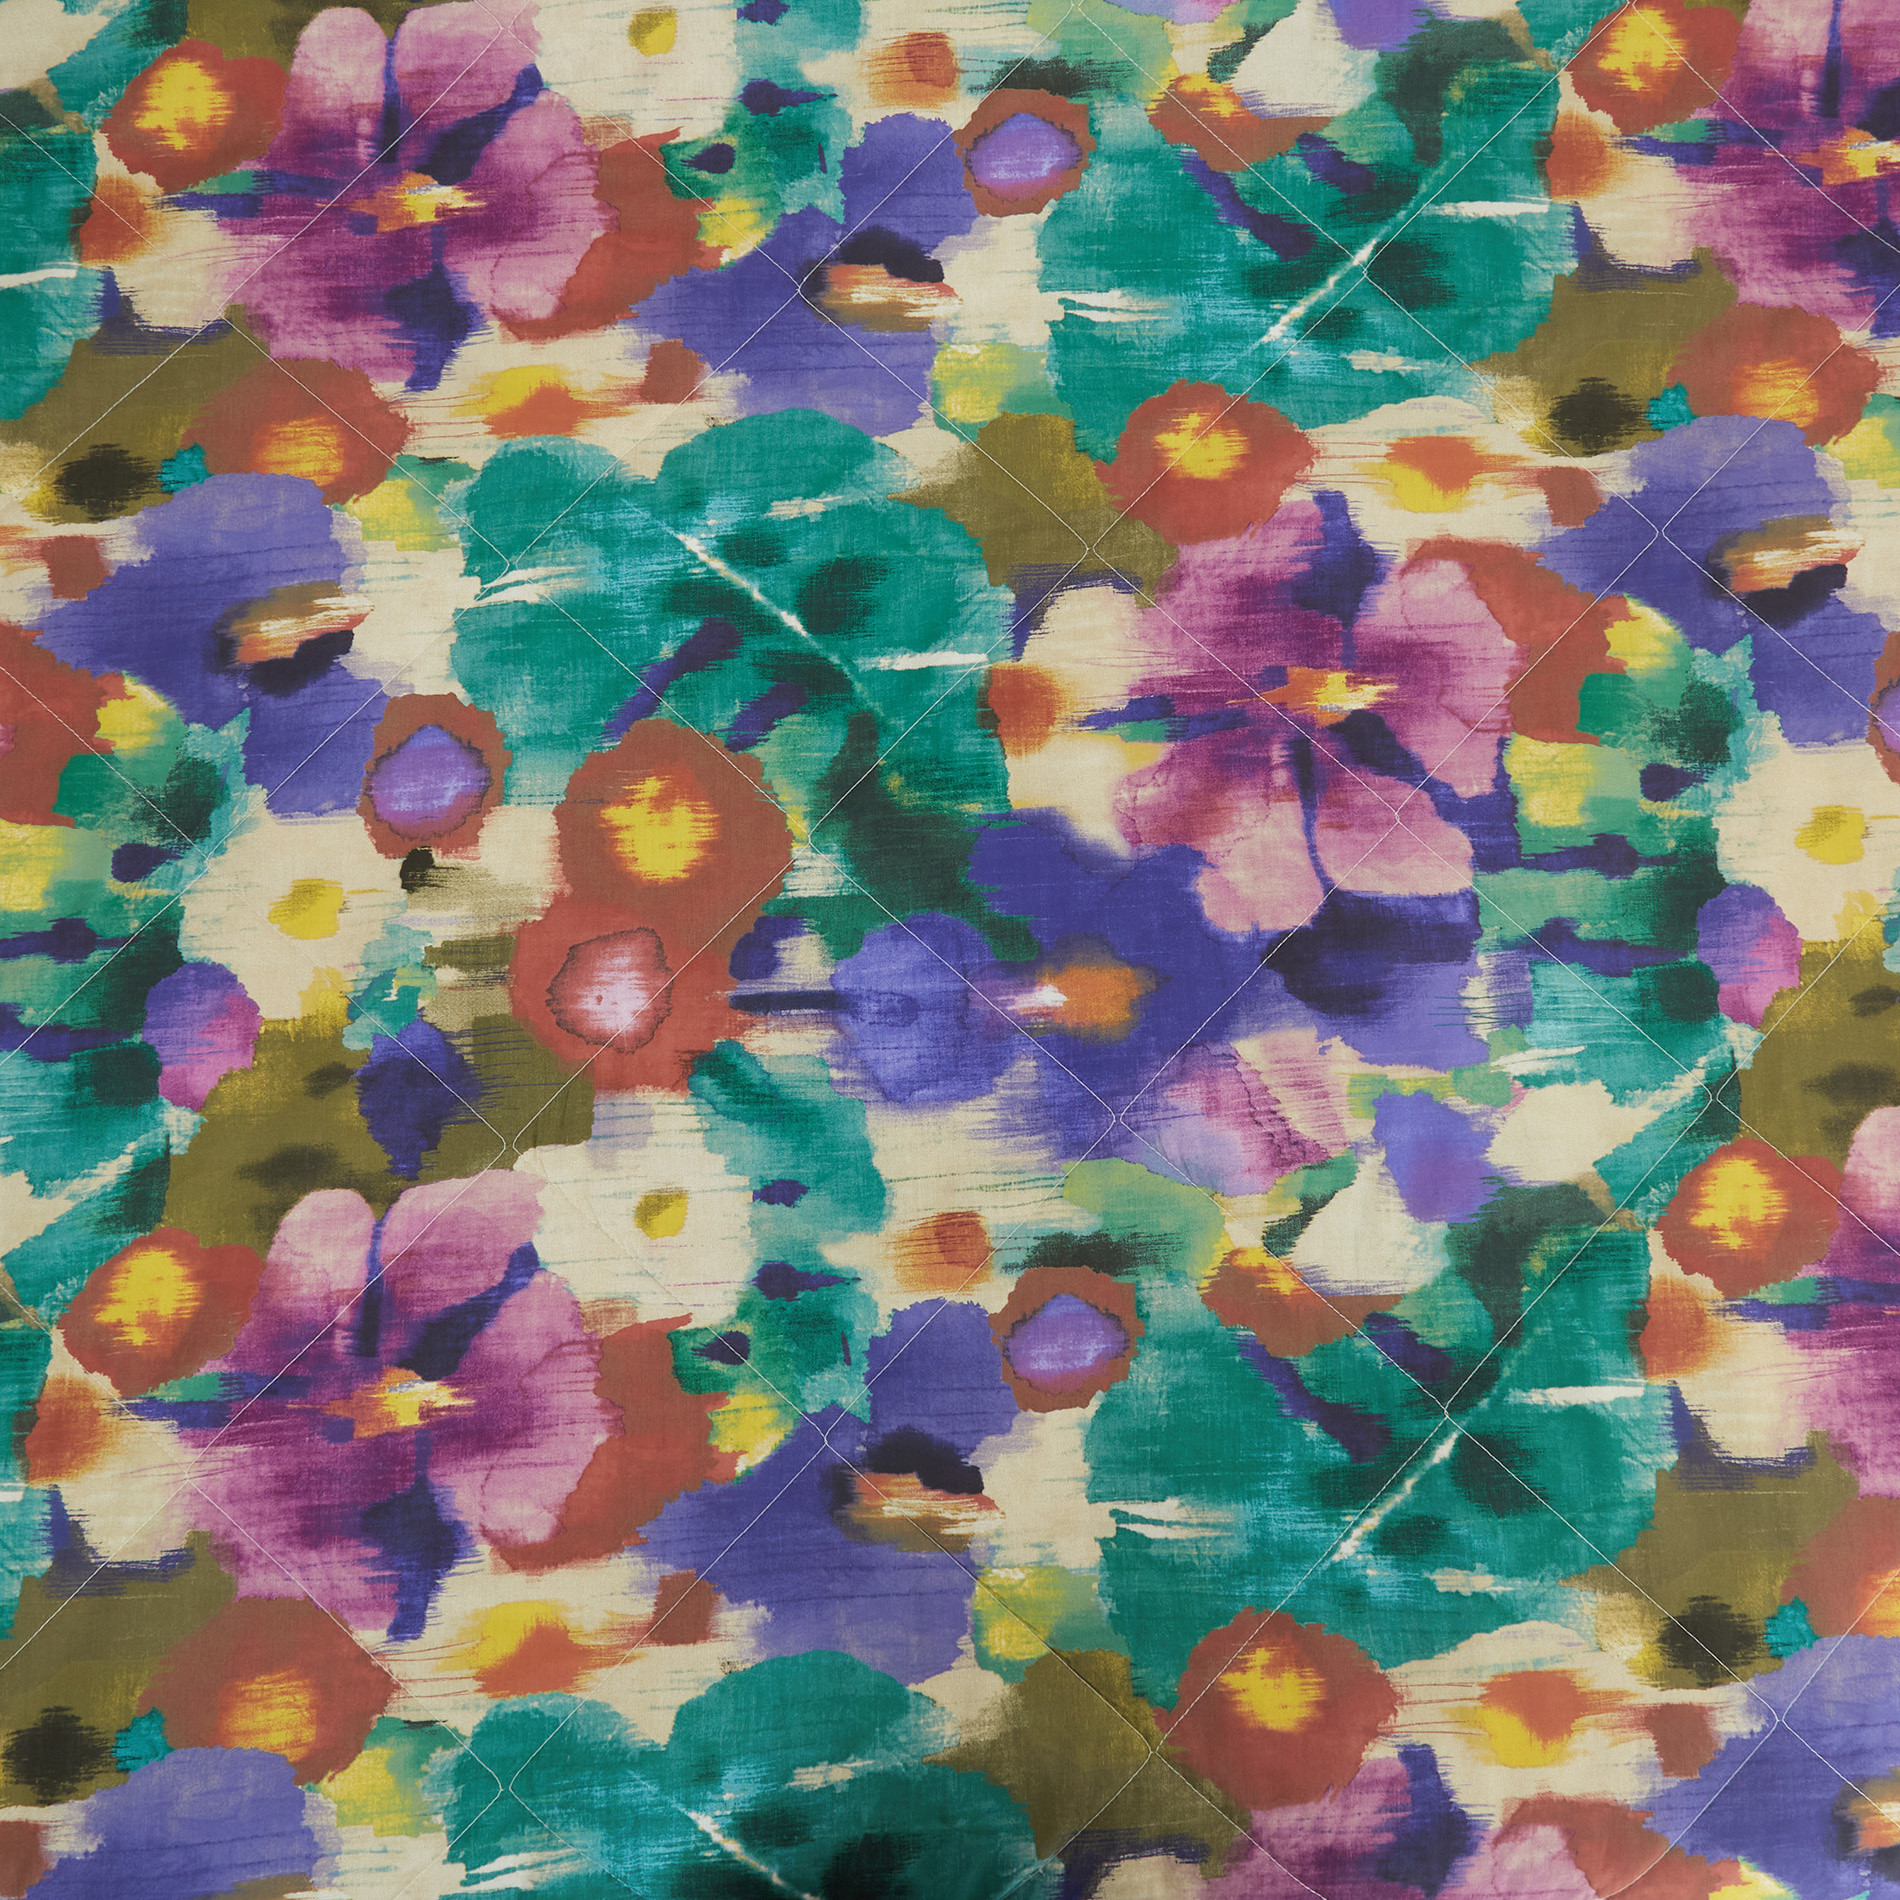 Trapunta cotone biologico fantasia amazzonia, Multicolor, large image number 2